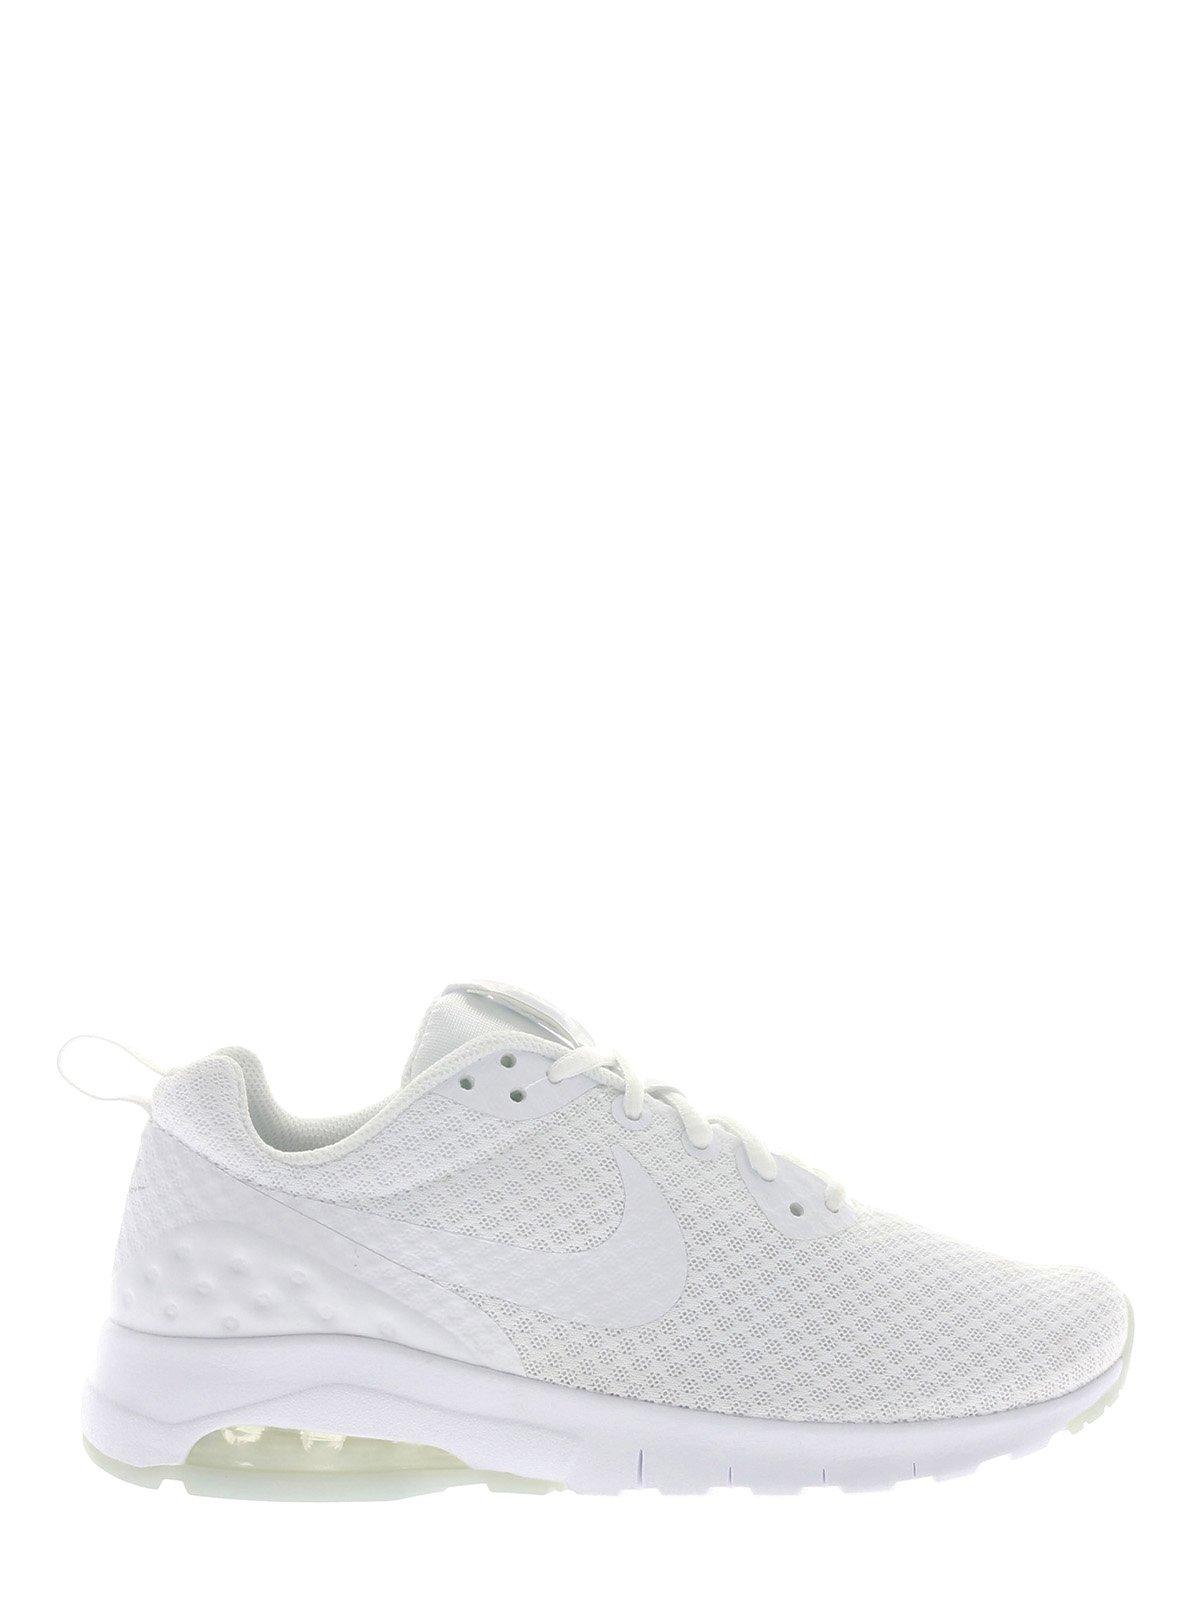 Кросівки білі WMNS AIR MAX MOTION LW AS — Nike b9fedeb3bbb24